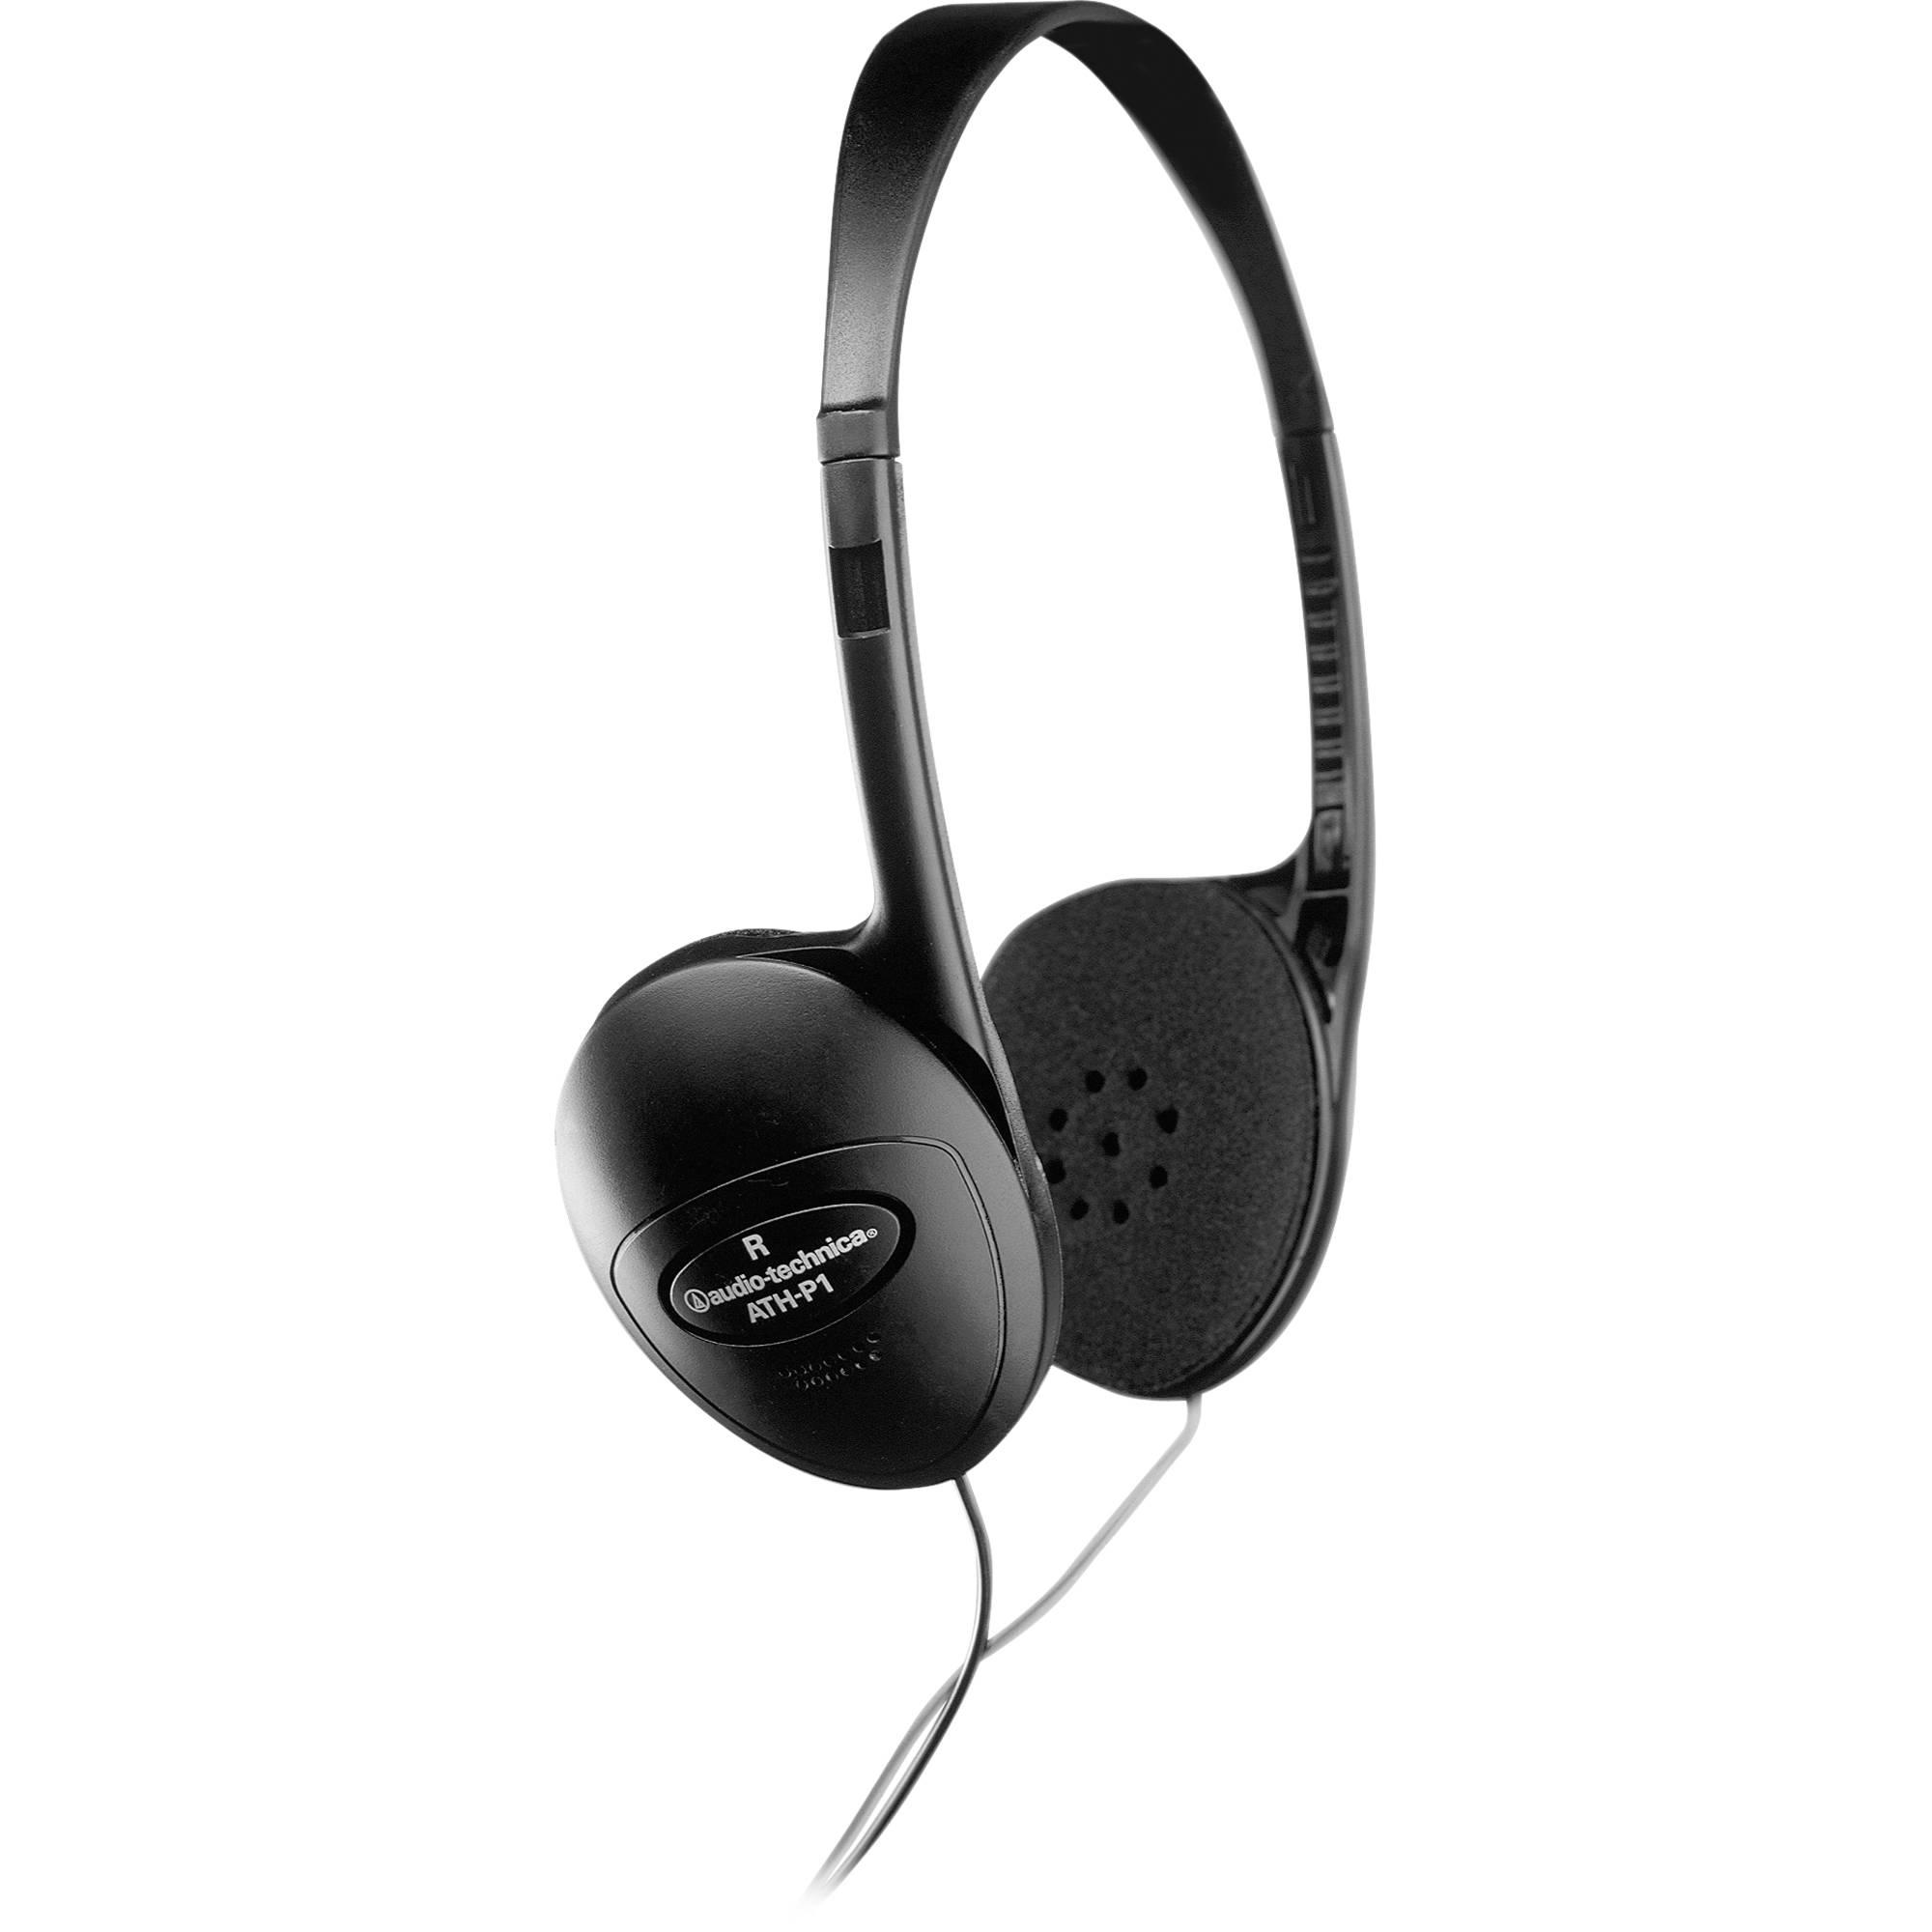 5a7b1418cf3 Audio-Technica ATH-P1 Headphone ATH-P1 B H Photo Video